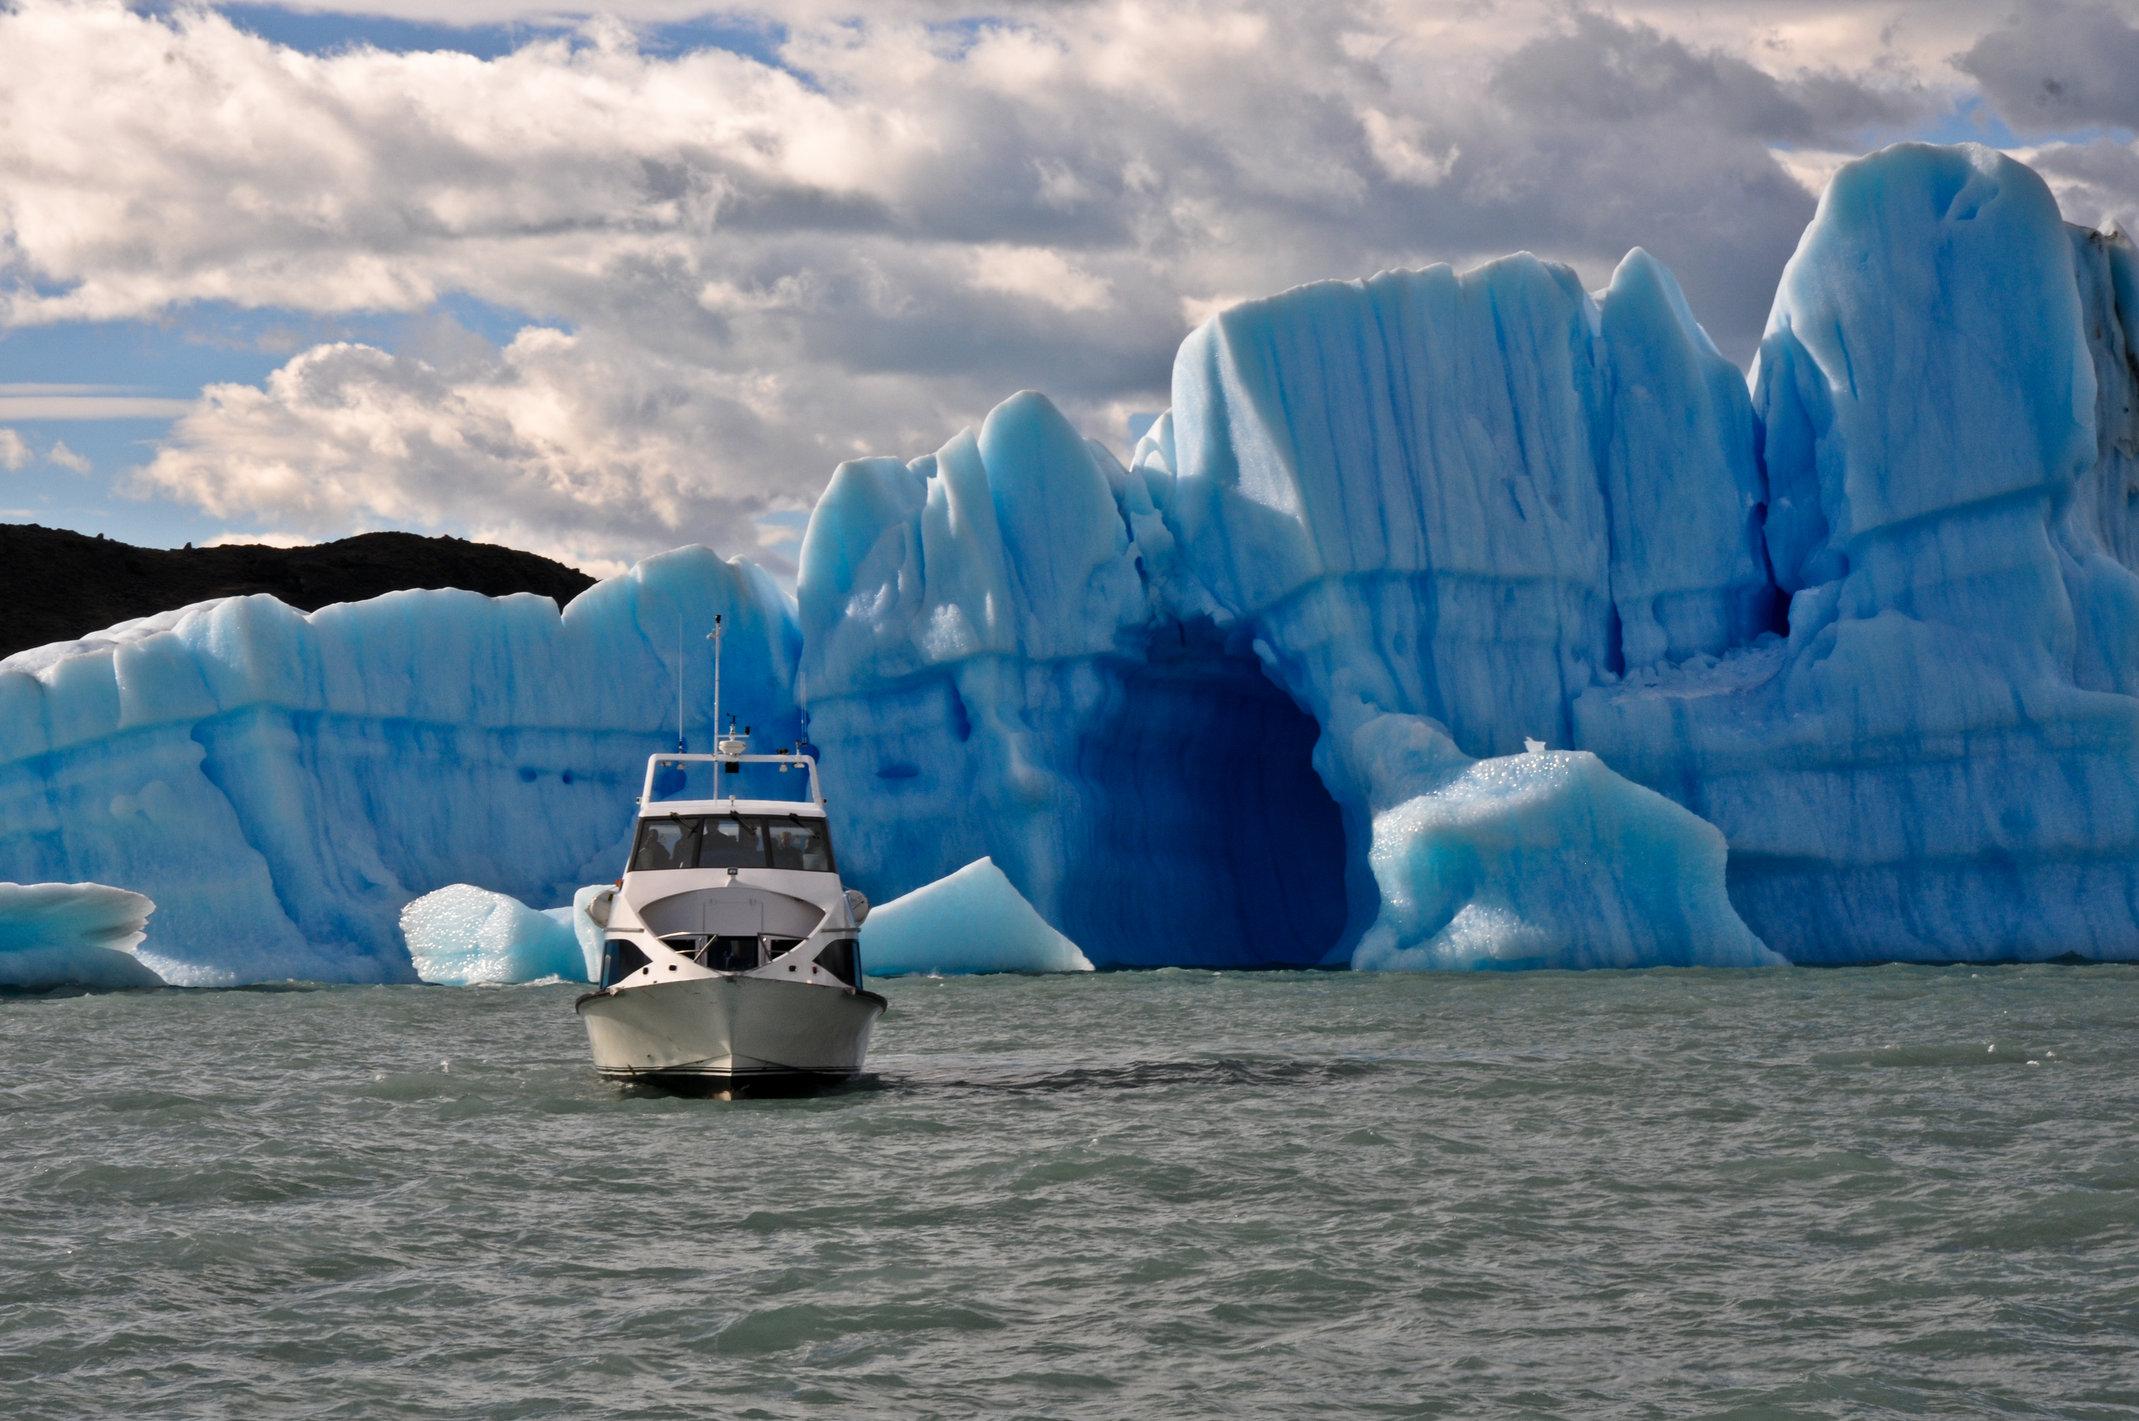 Trajeto de barco pelo lago argentino para chegar na Estancia Cristina.